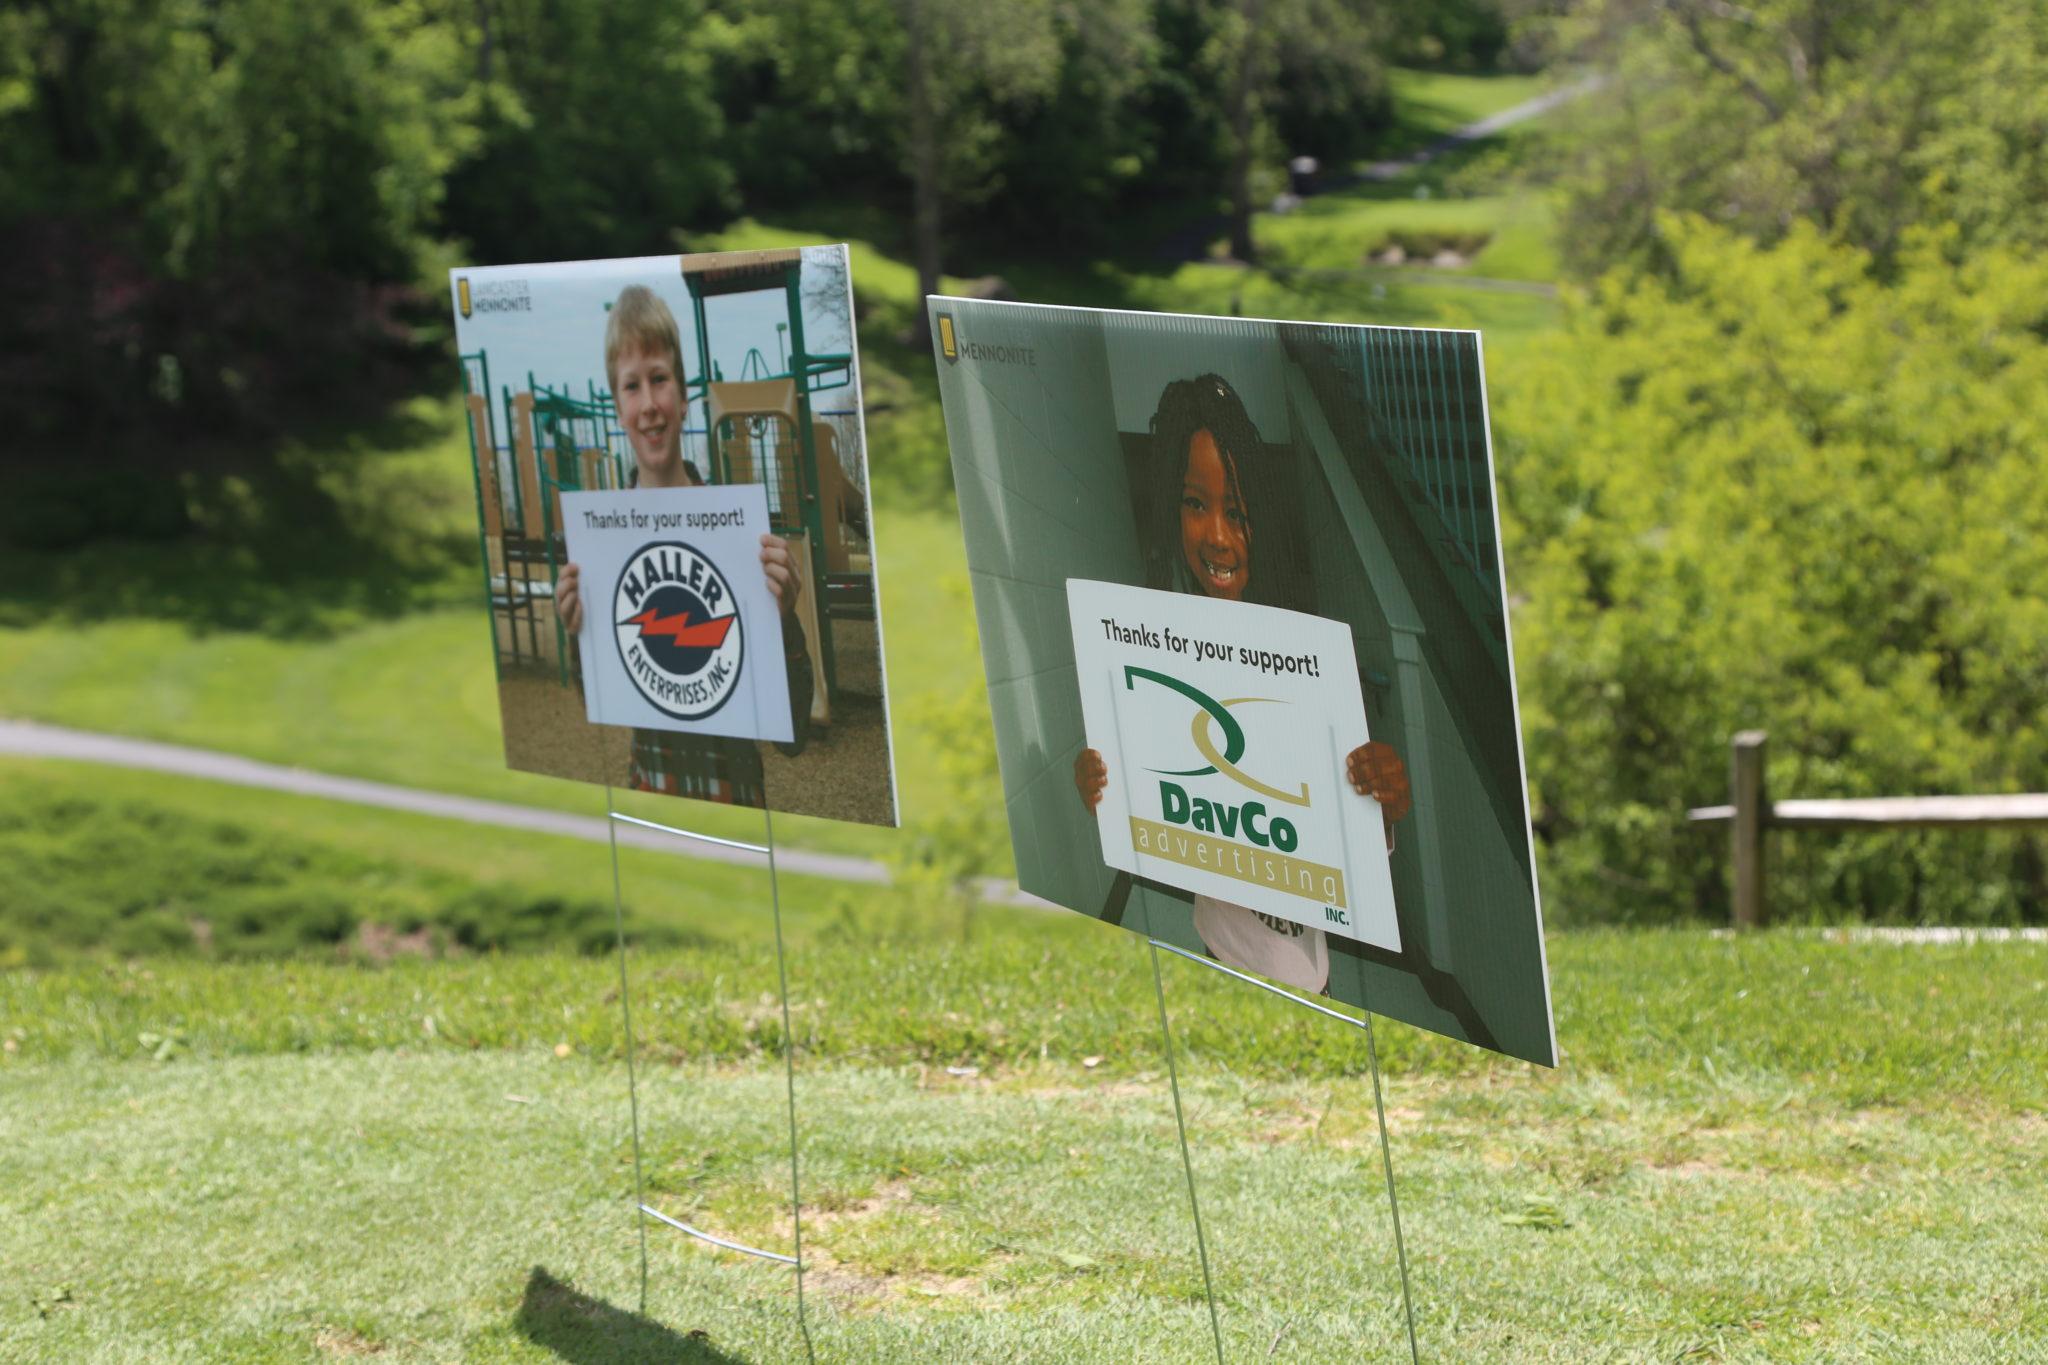 golf tee sponsor signs, daveco & haller enterprises